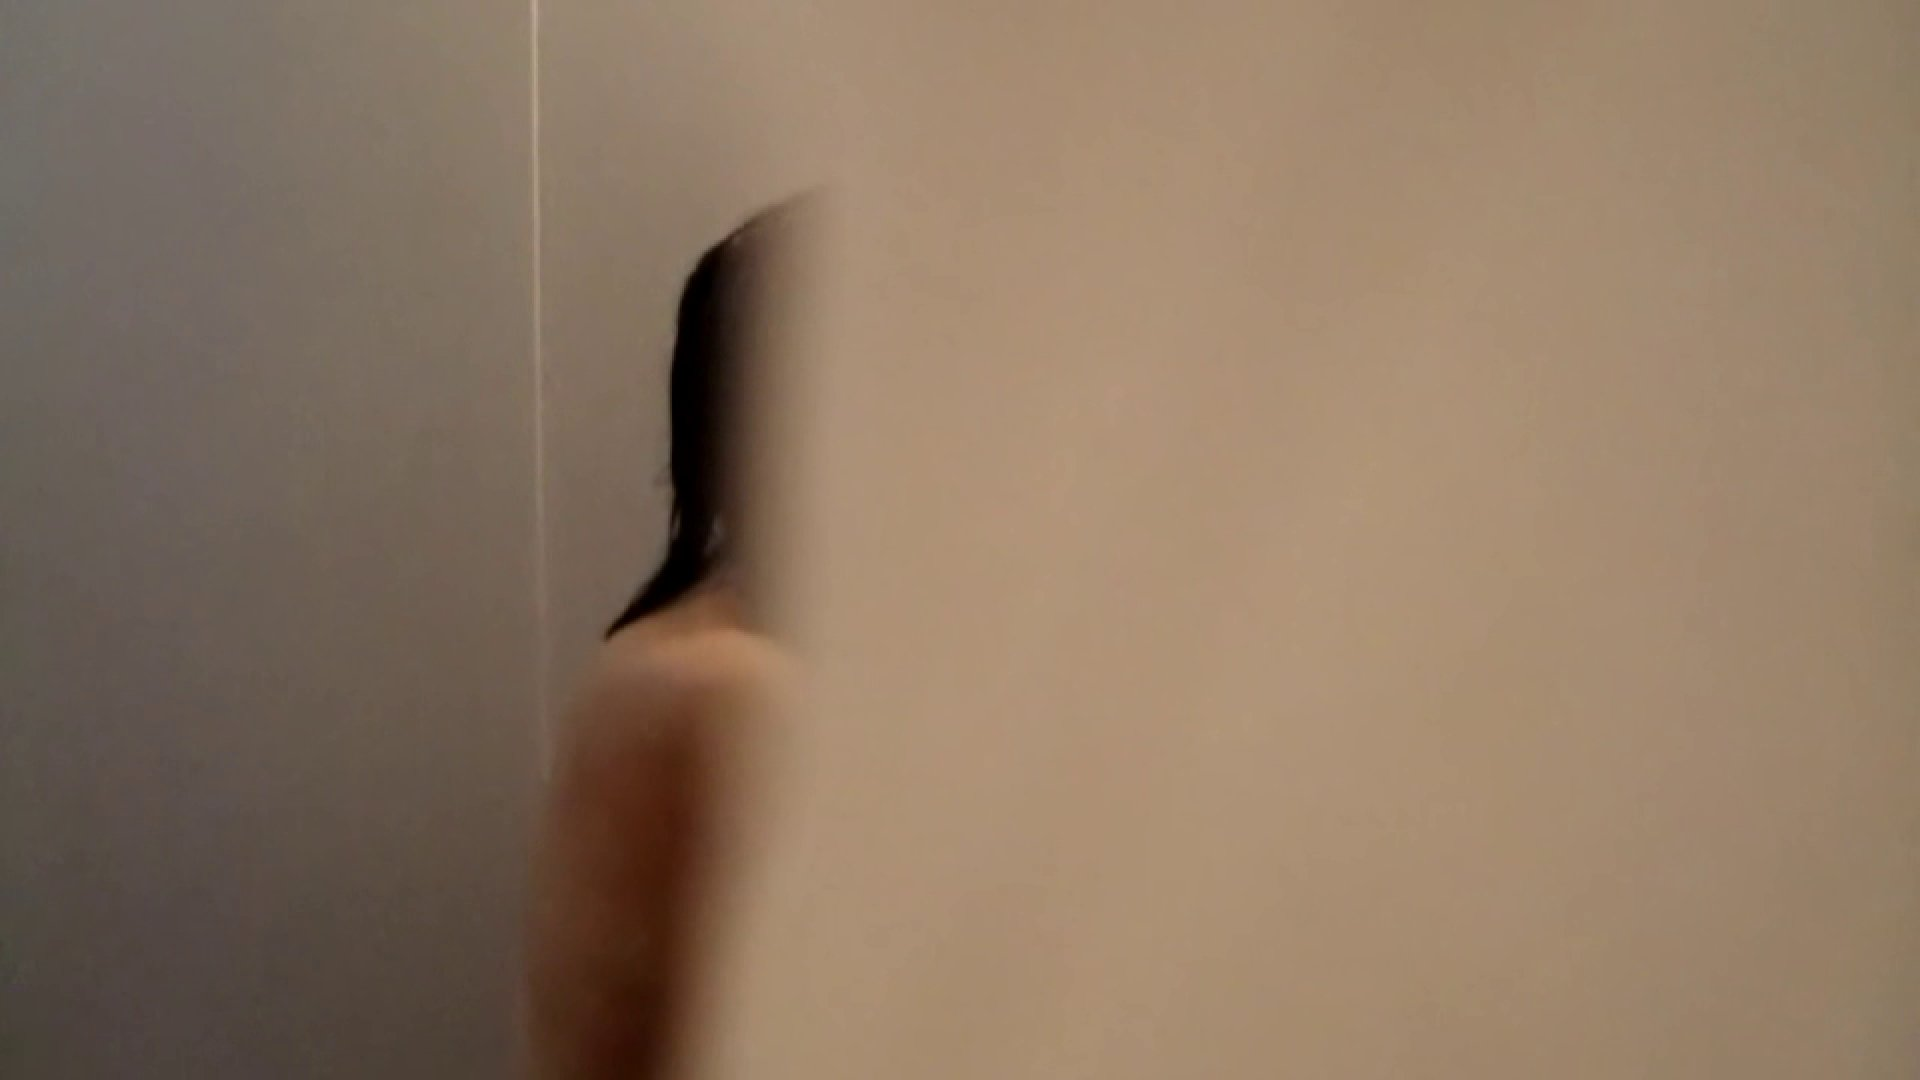 vol.2 葵のグラドル顔負けの爆乳を入浴シーンでどうぞ。 爆乳 すけべAV動画紹介 64PIX 11